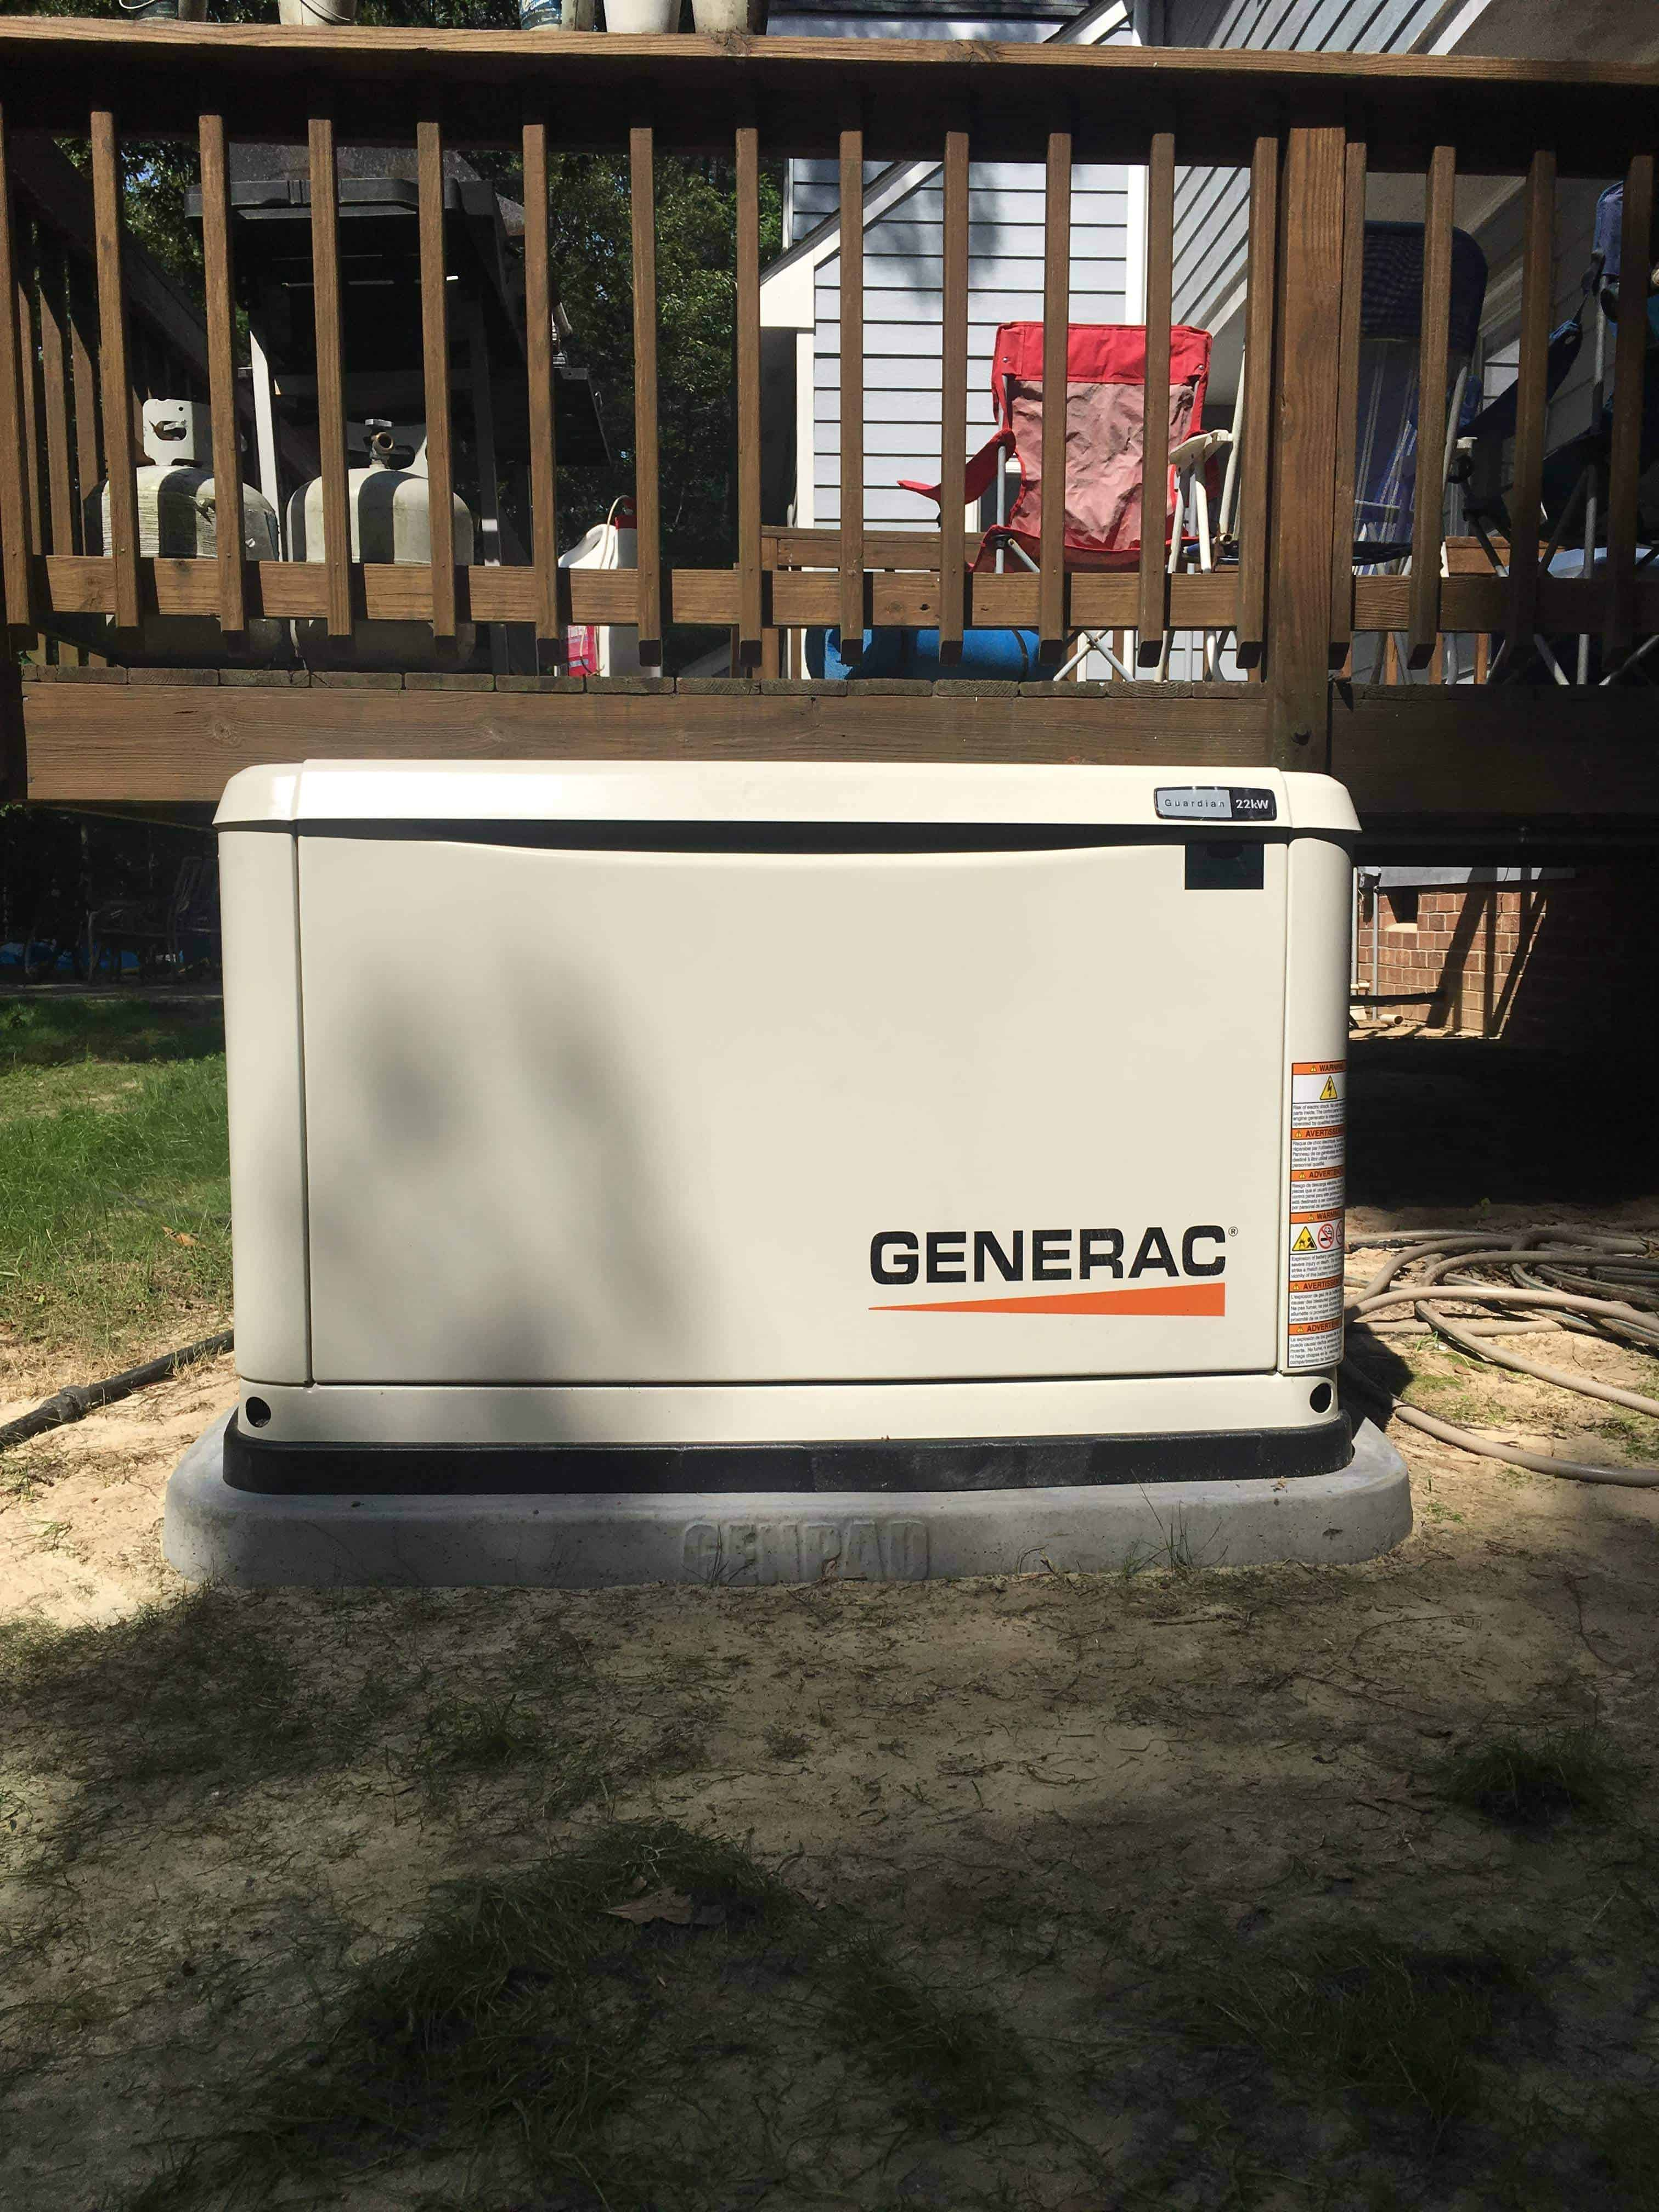 Generac Automatic Standby Generator City of Petersburg